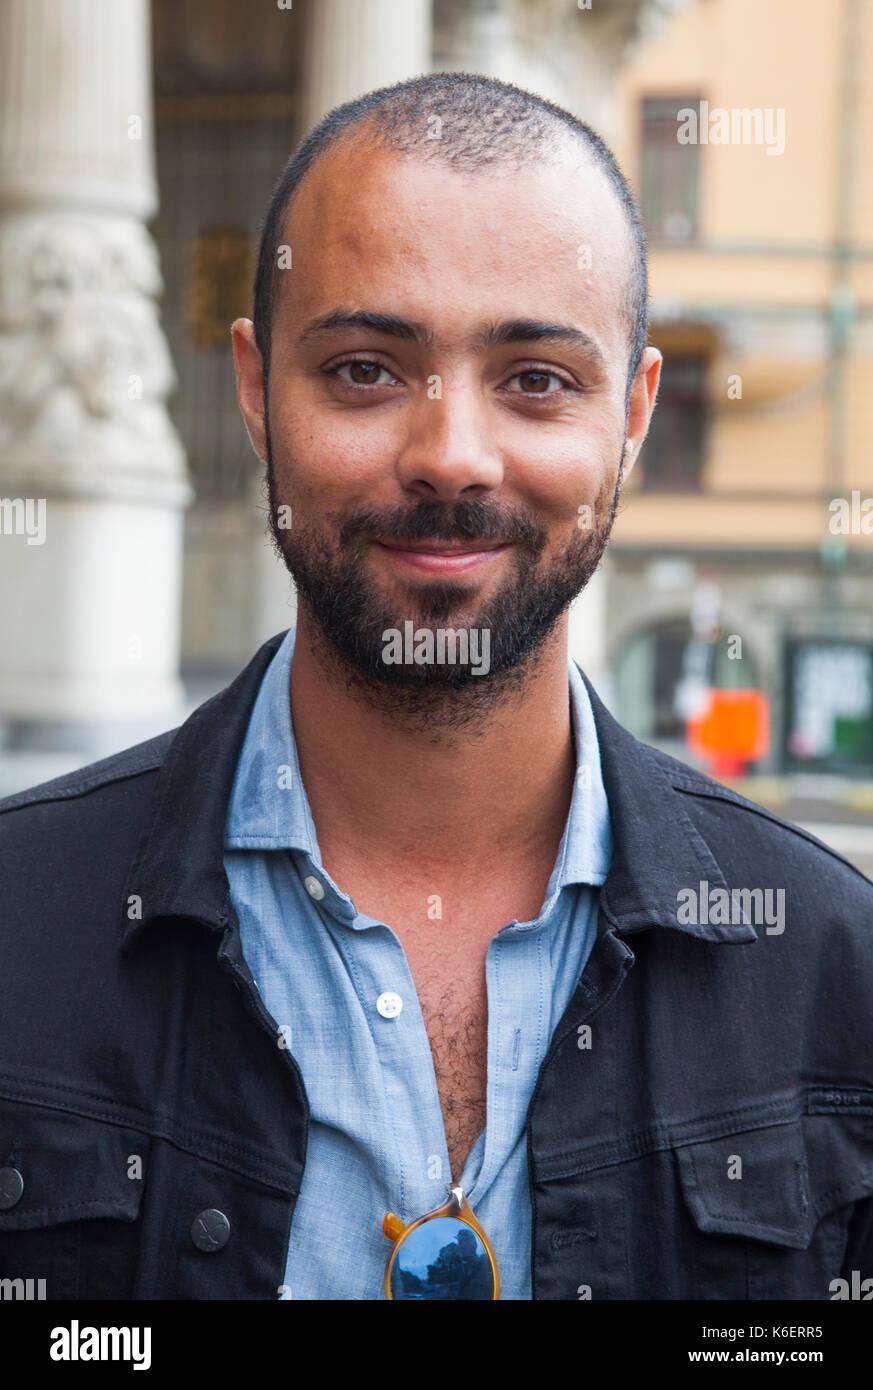 ALEXANDER SALZBERGER Swedish actor at Royal Dramatic Theater 2017 - Stock Image